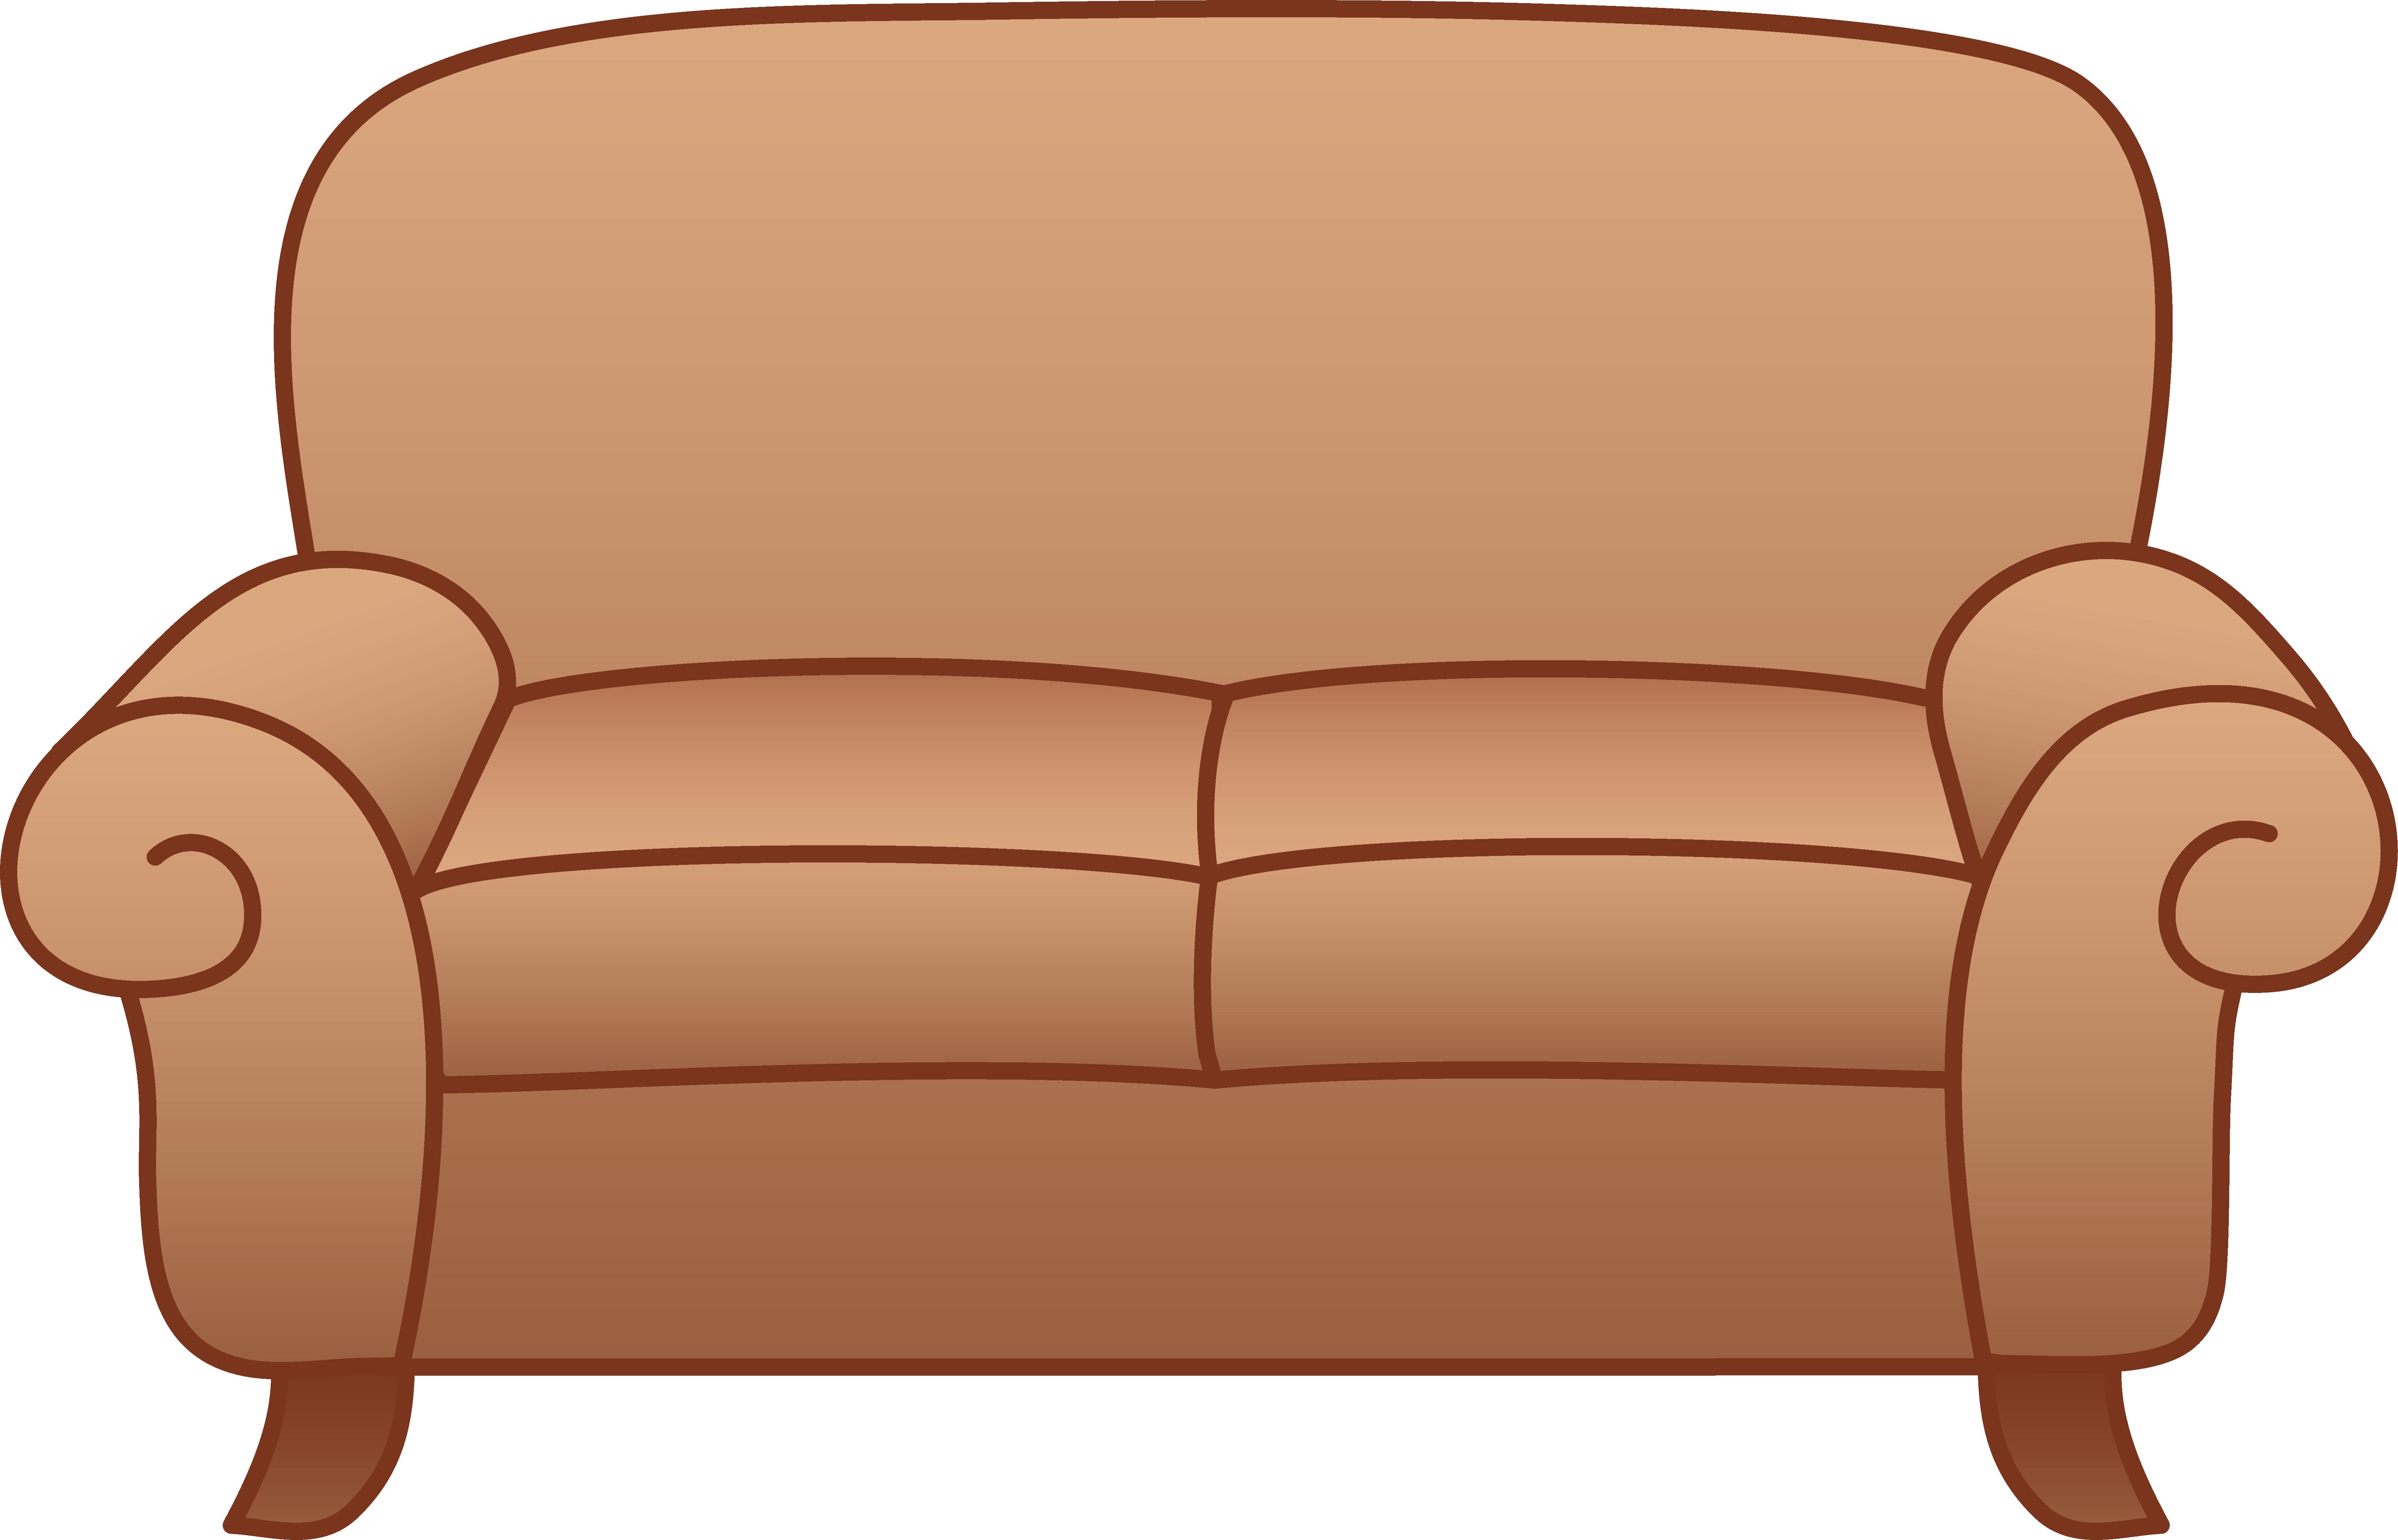 6947x4462 Beige Living Room Sofa